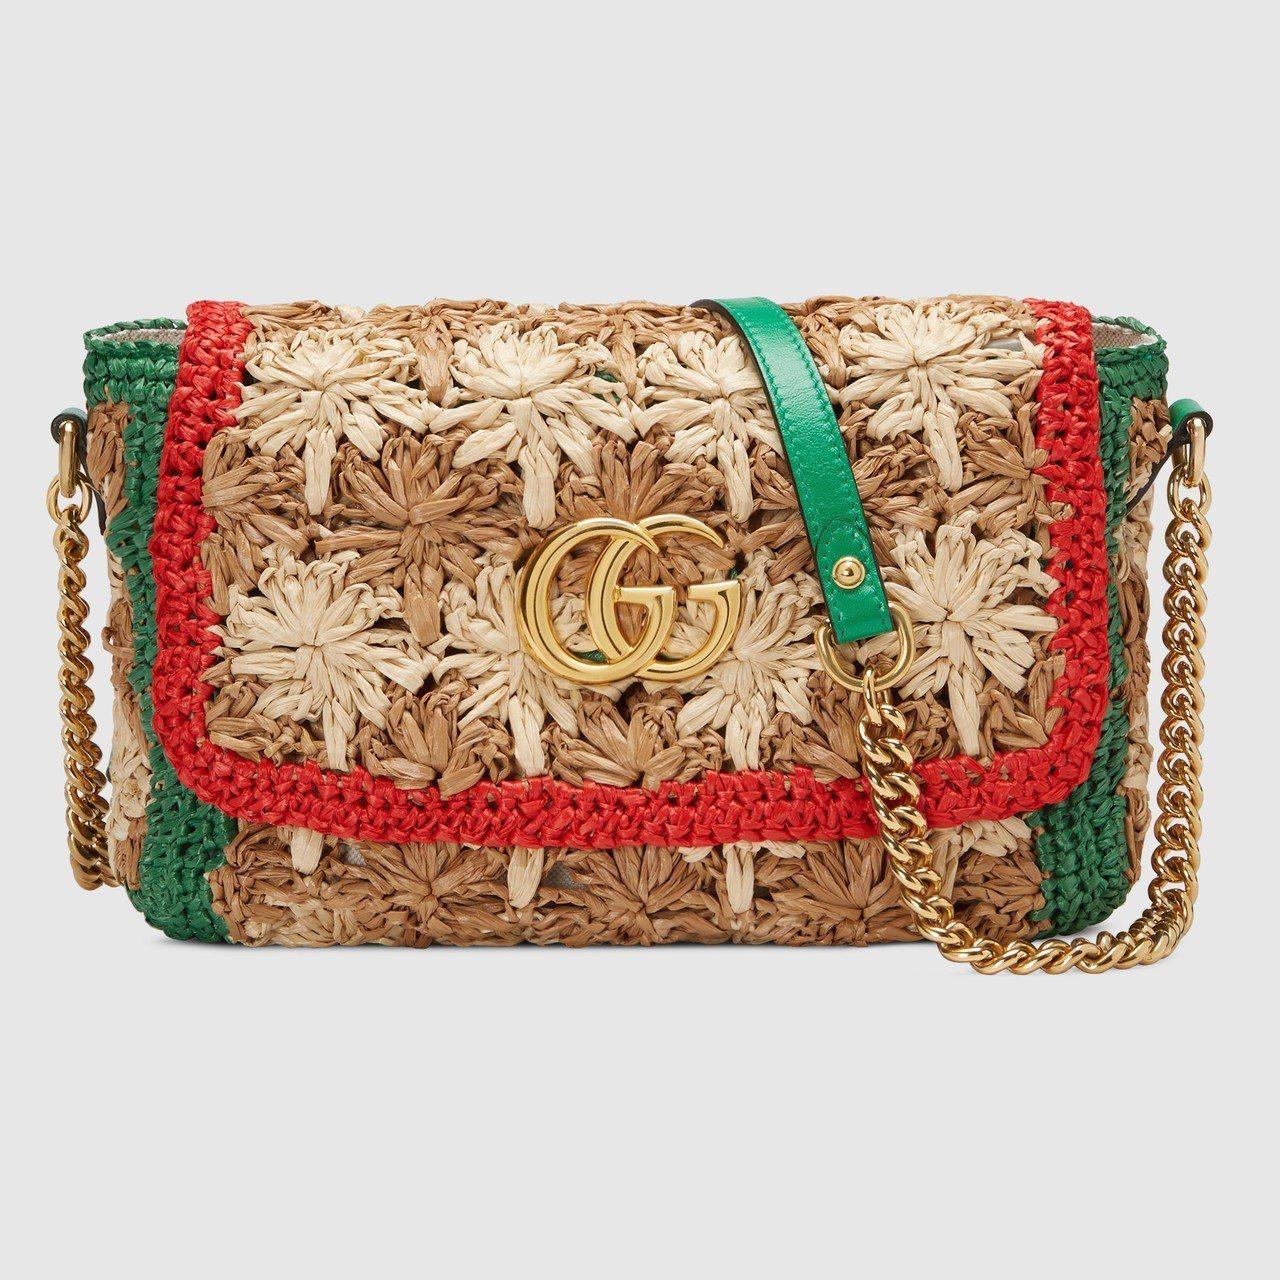 Gucci GG Marmont勾織花卉翻蓋包,67,200元。圖/Gucci提...